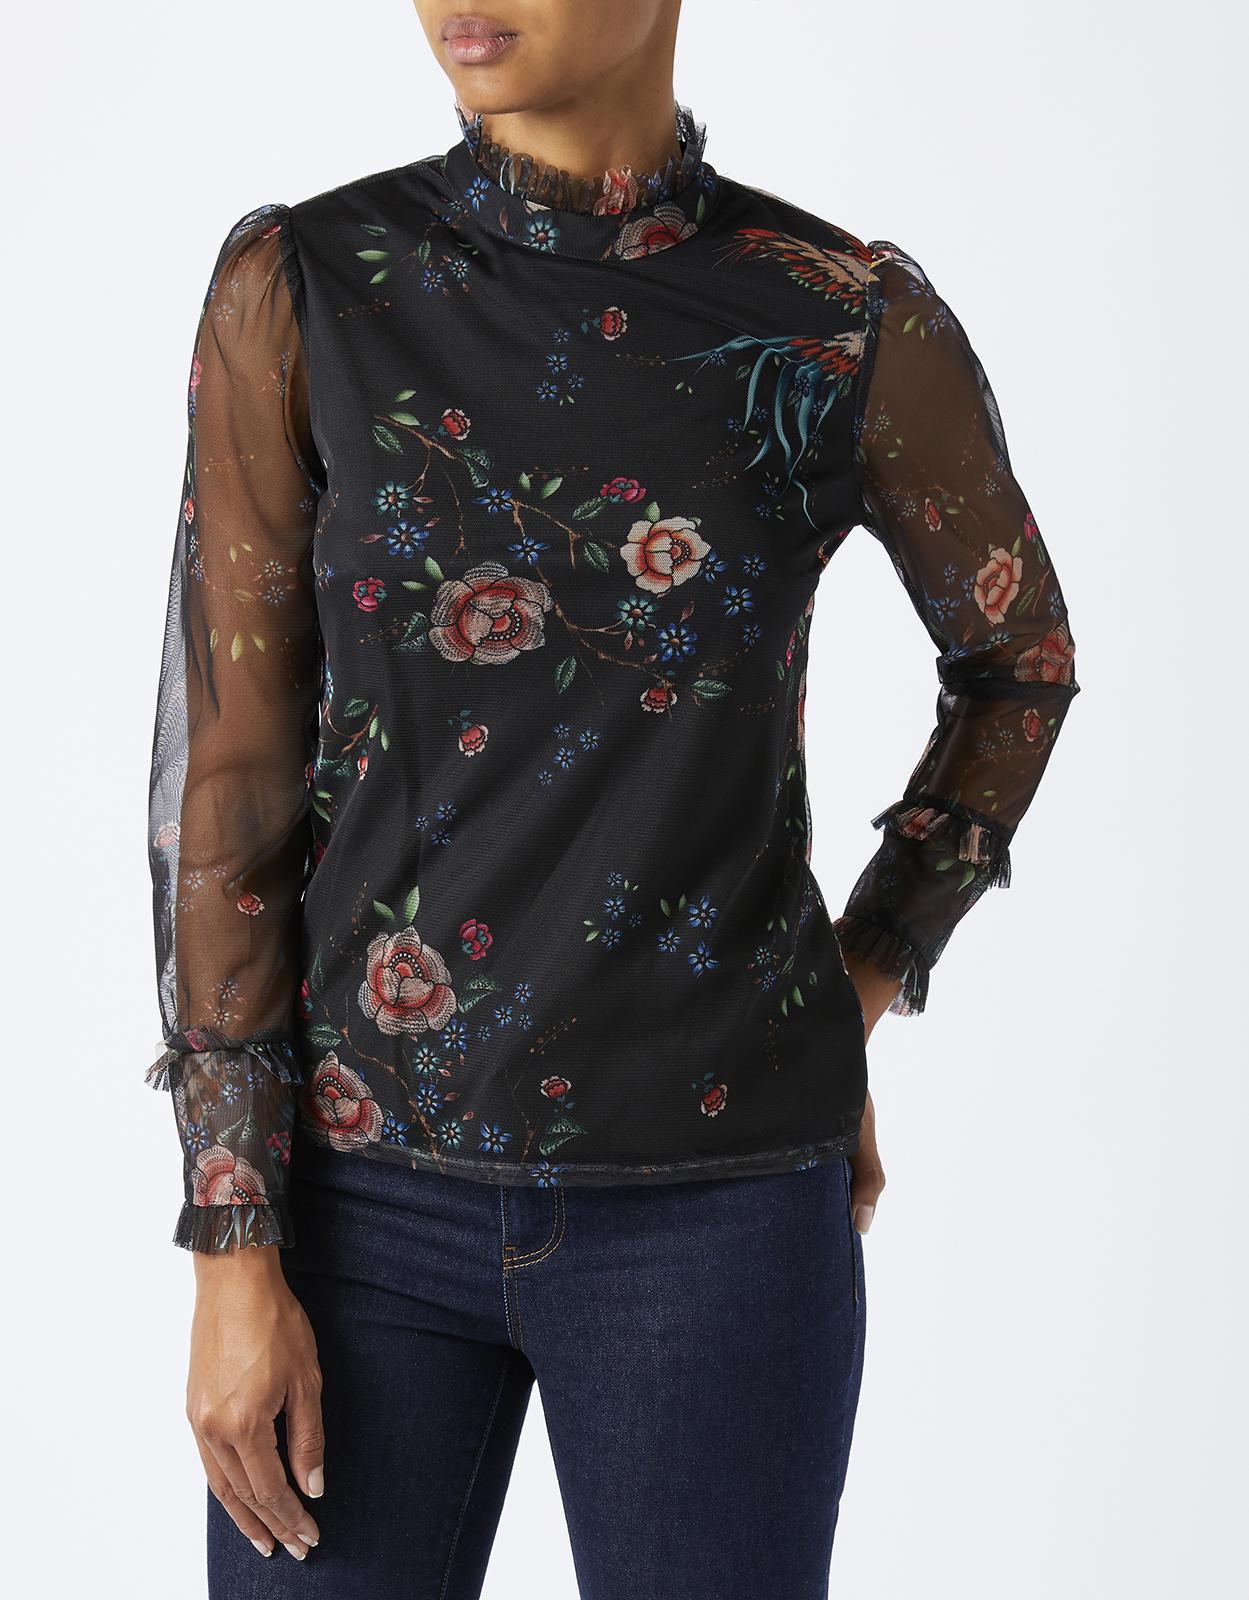 Cheap Monsoon Fiorella Printed Mesh Top on sale